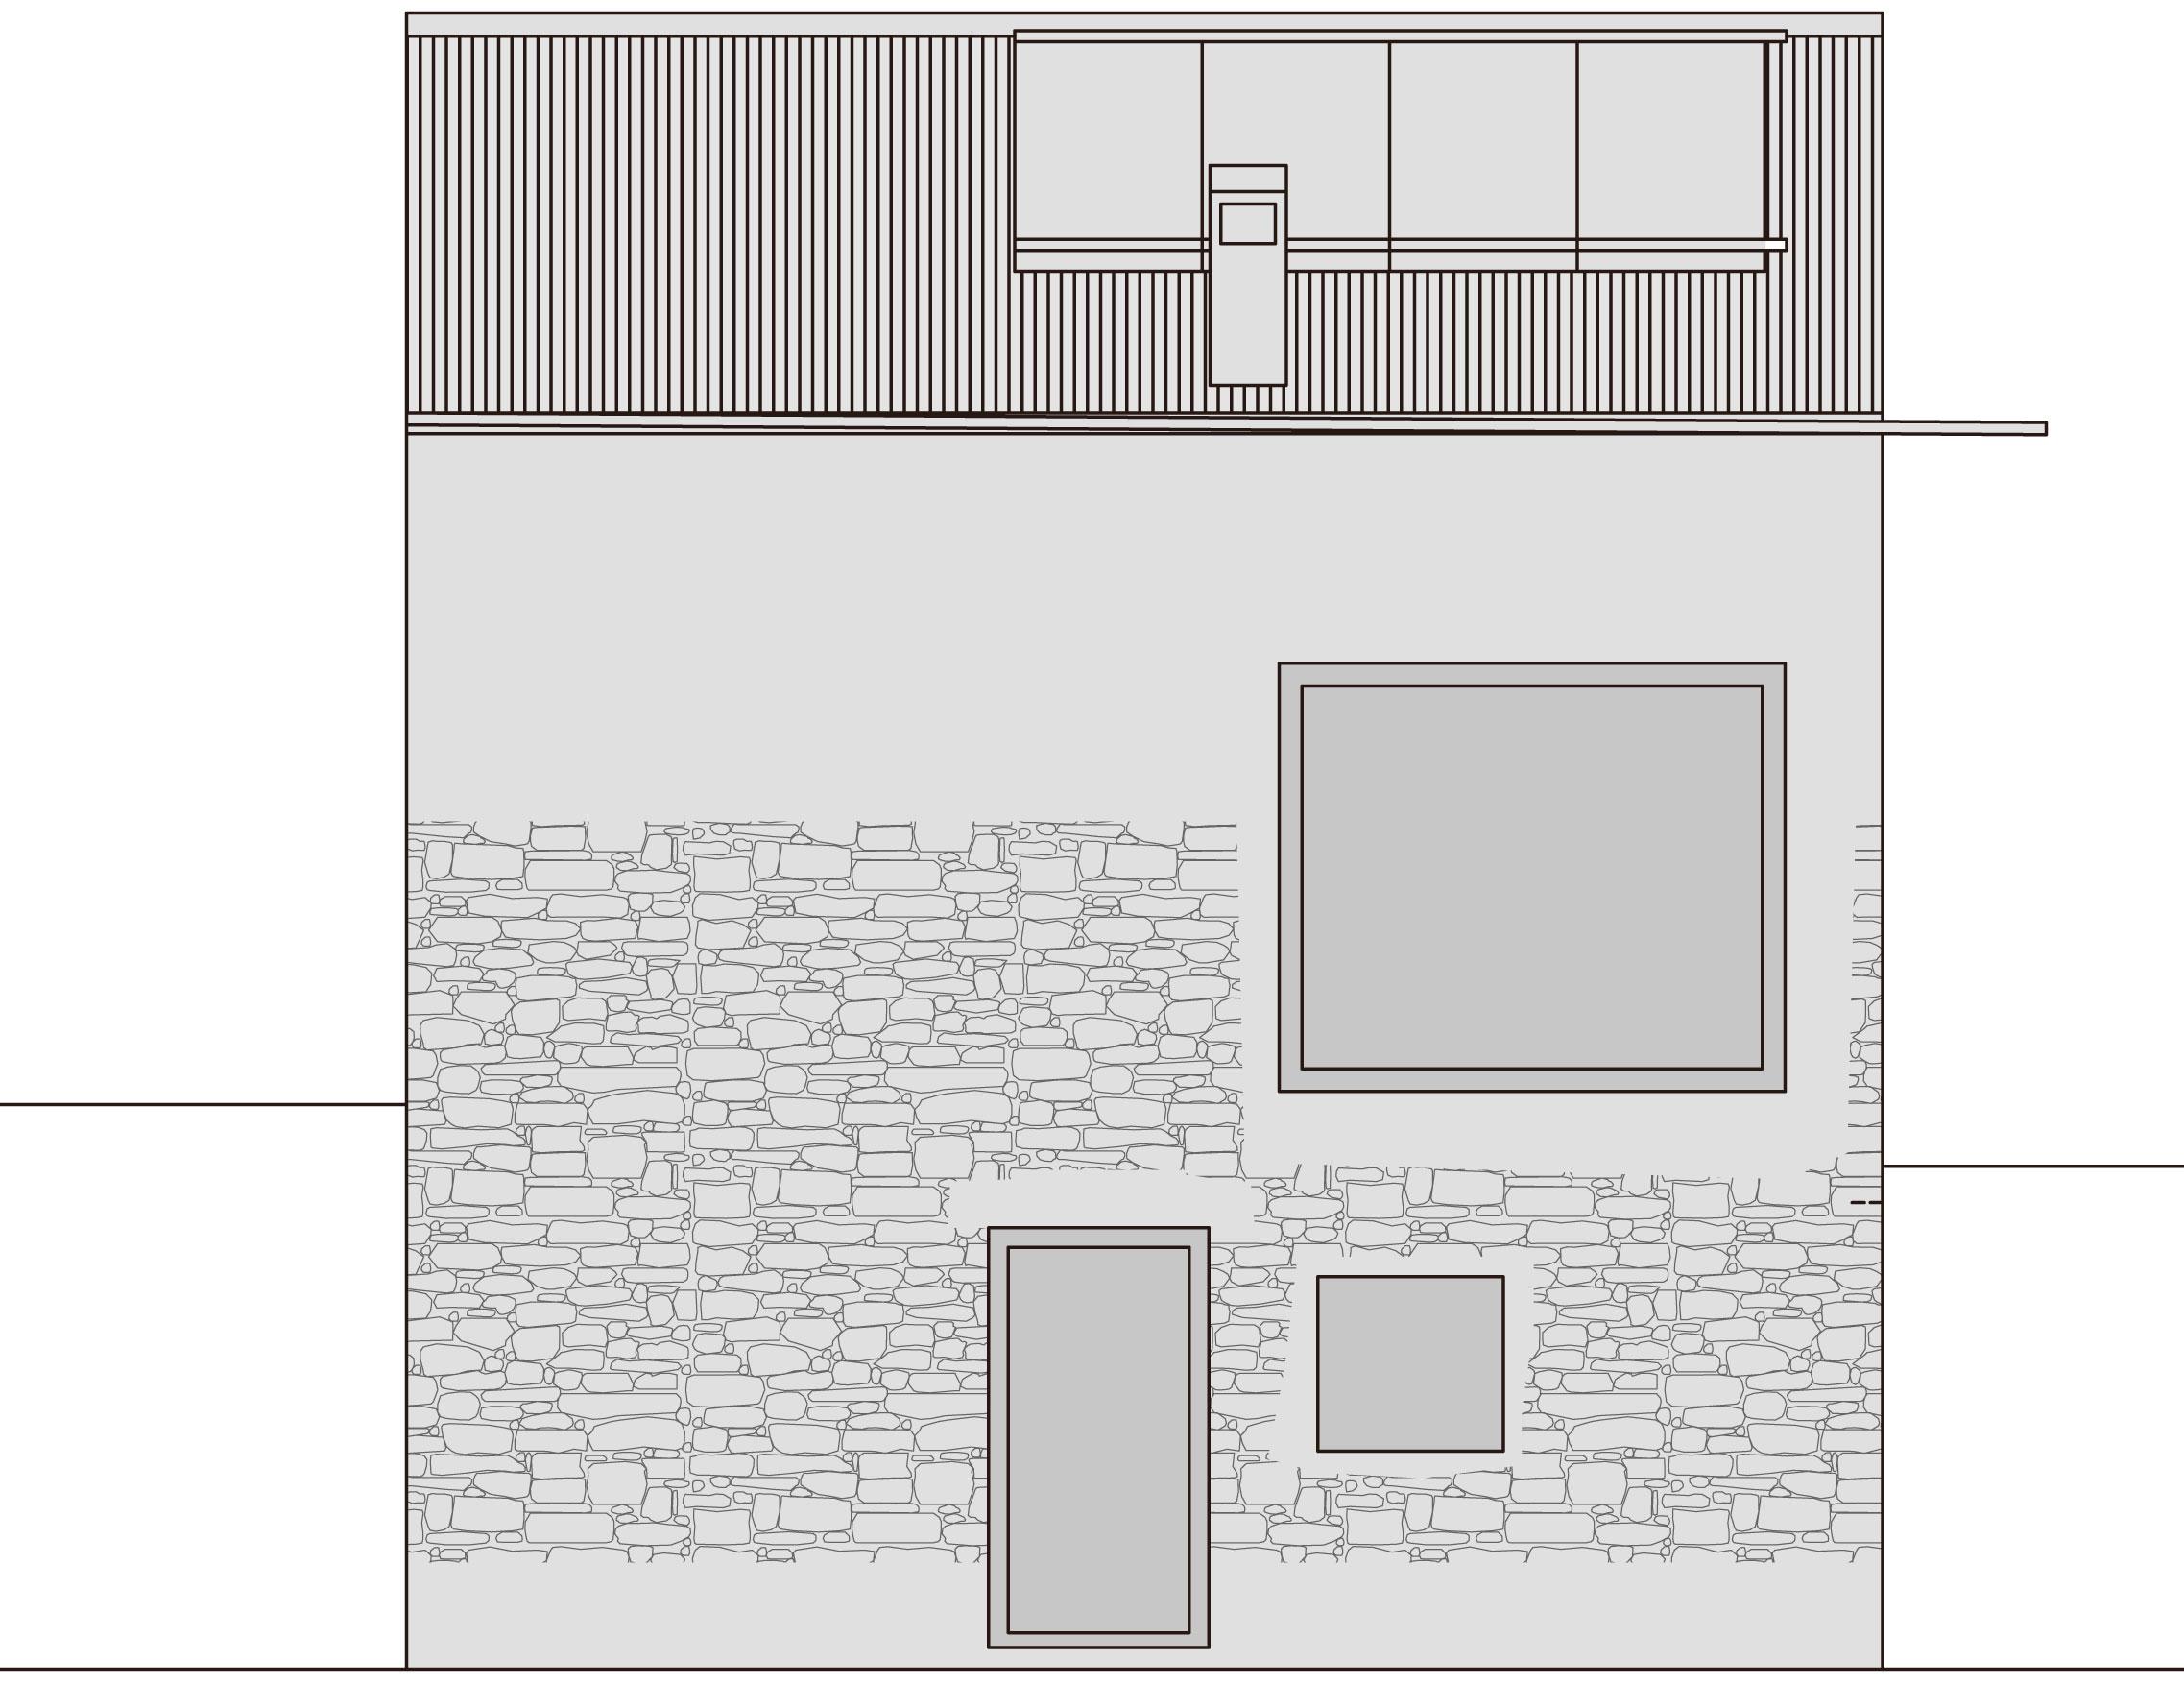 Elevation, Holiday Home Renovation in Ayent, Switzerland